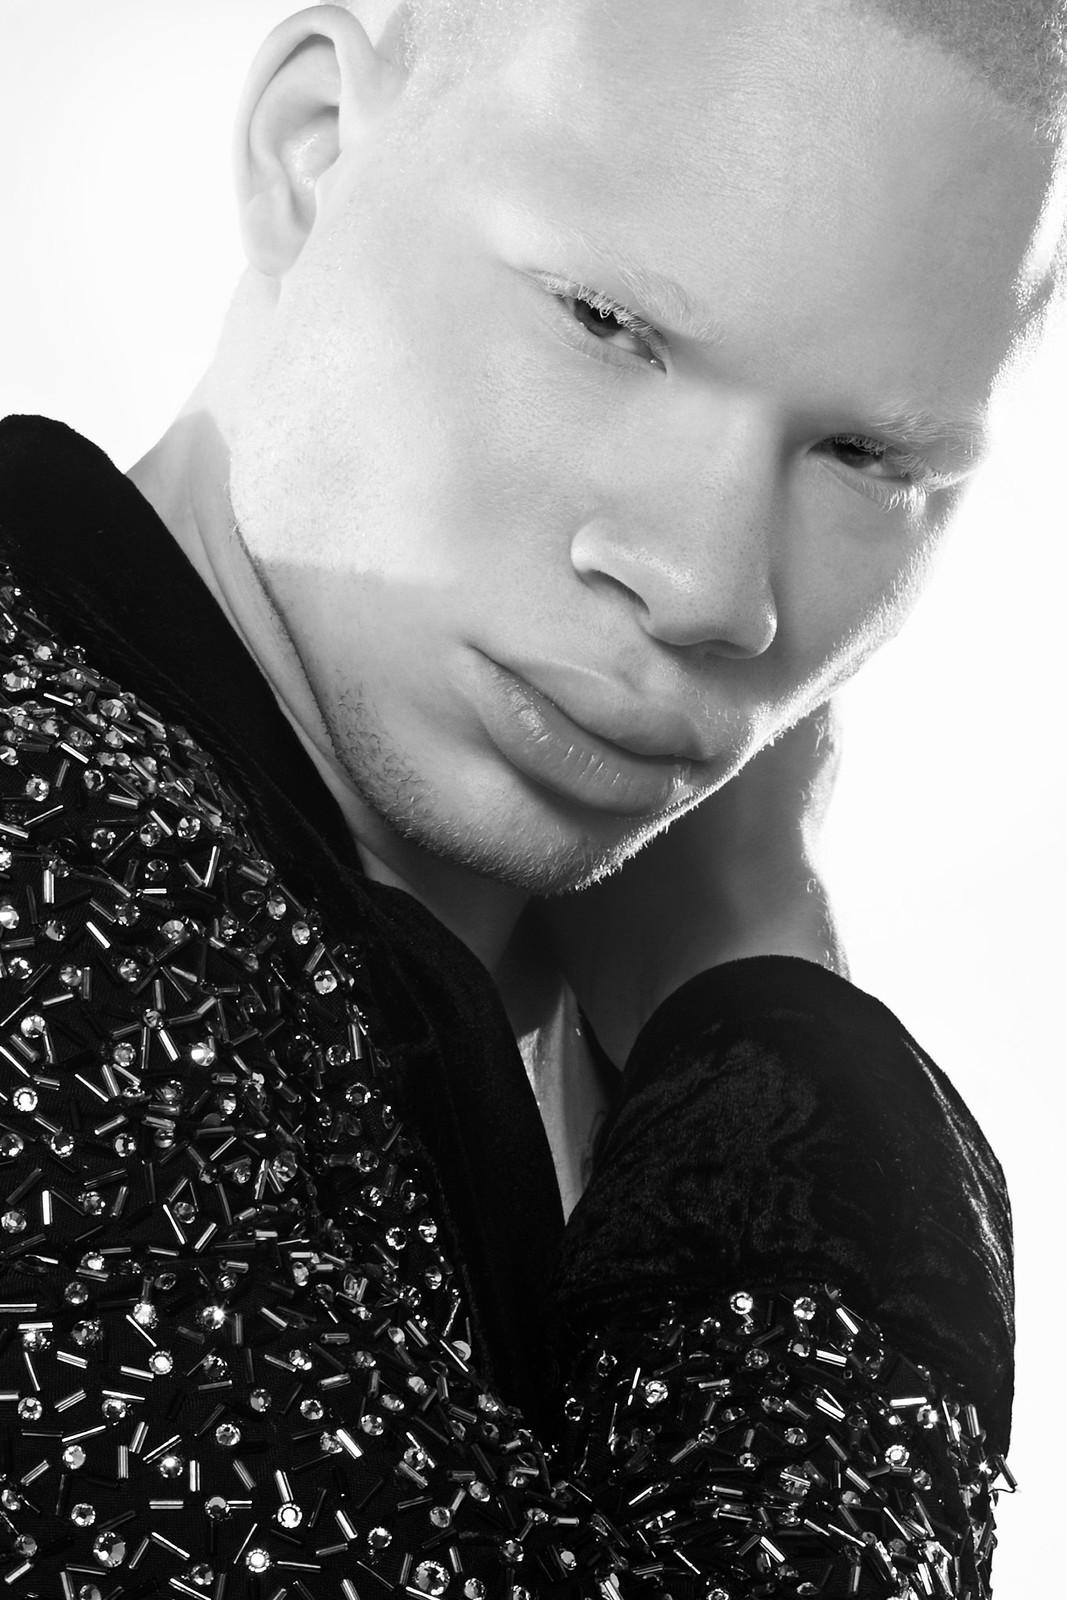 Black Albino Actor Model Albino Actor